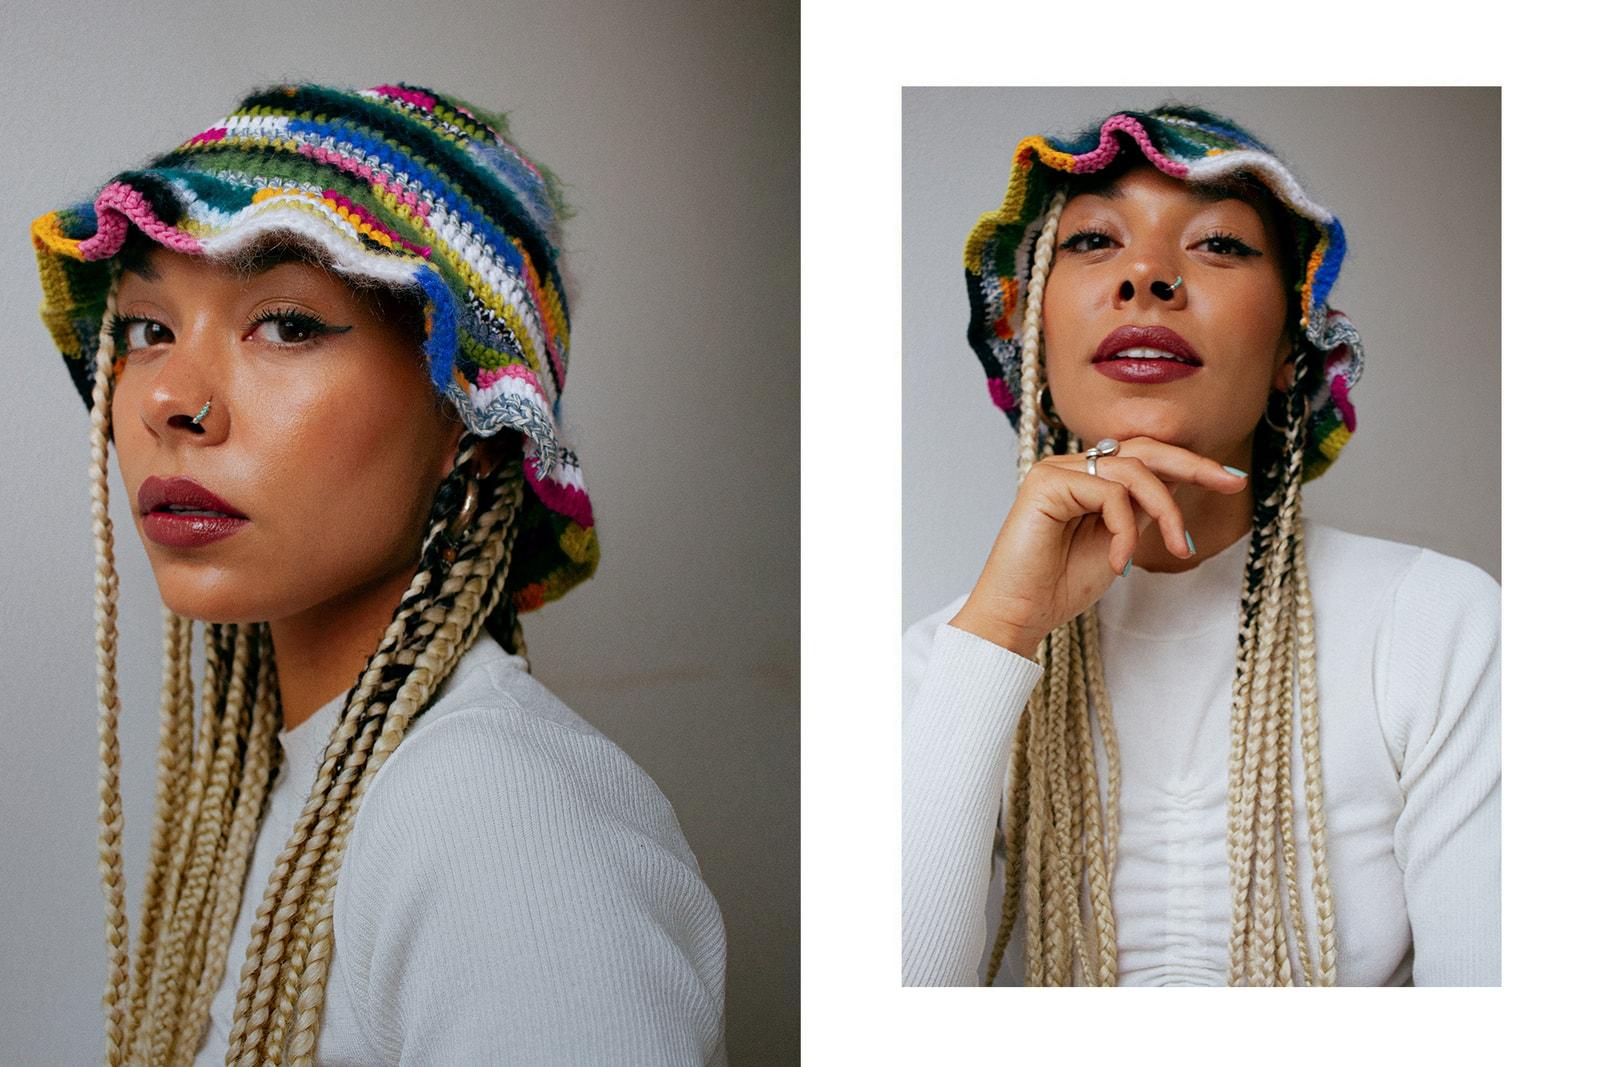 iyamah sophie bond truth ep 2 british neo soul reggae emerging artist musician uk